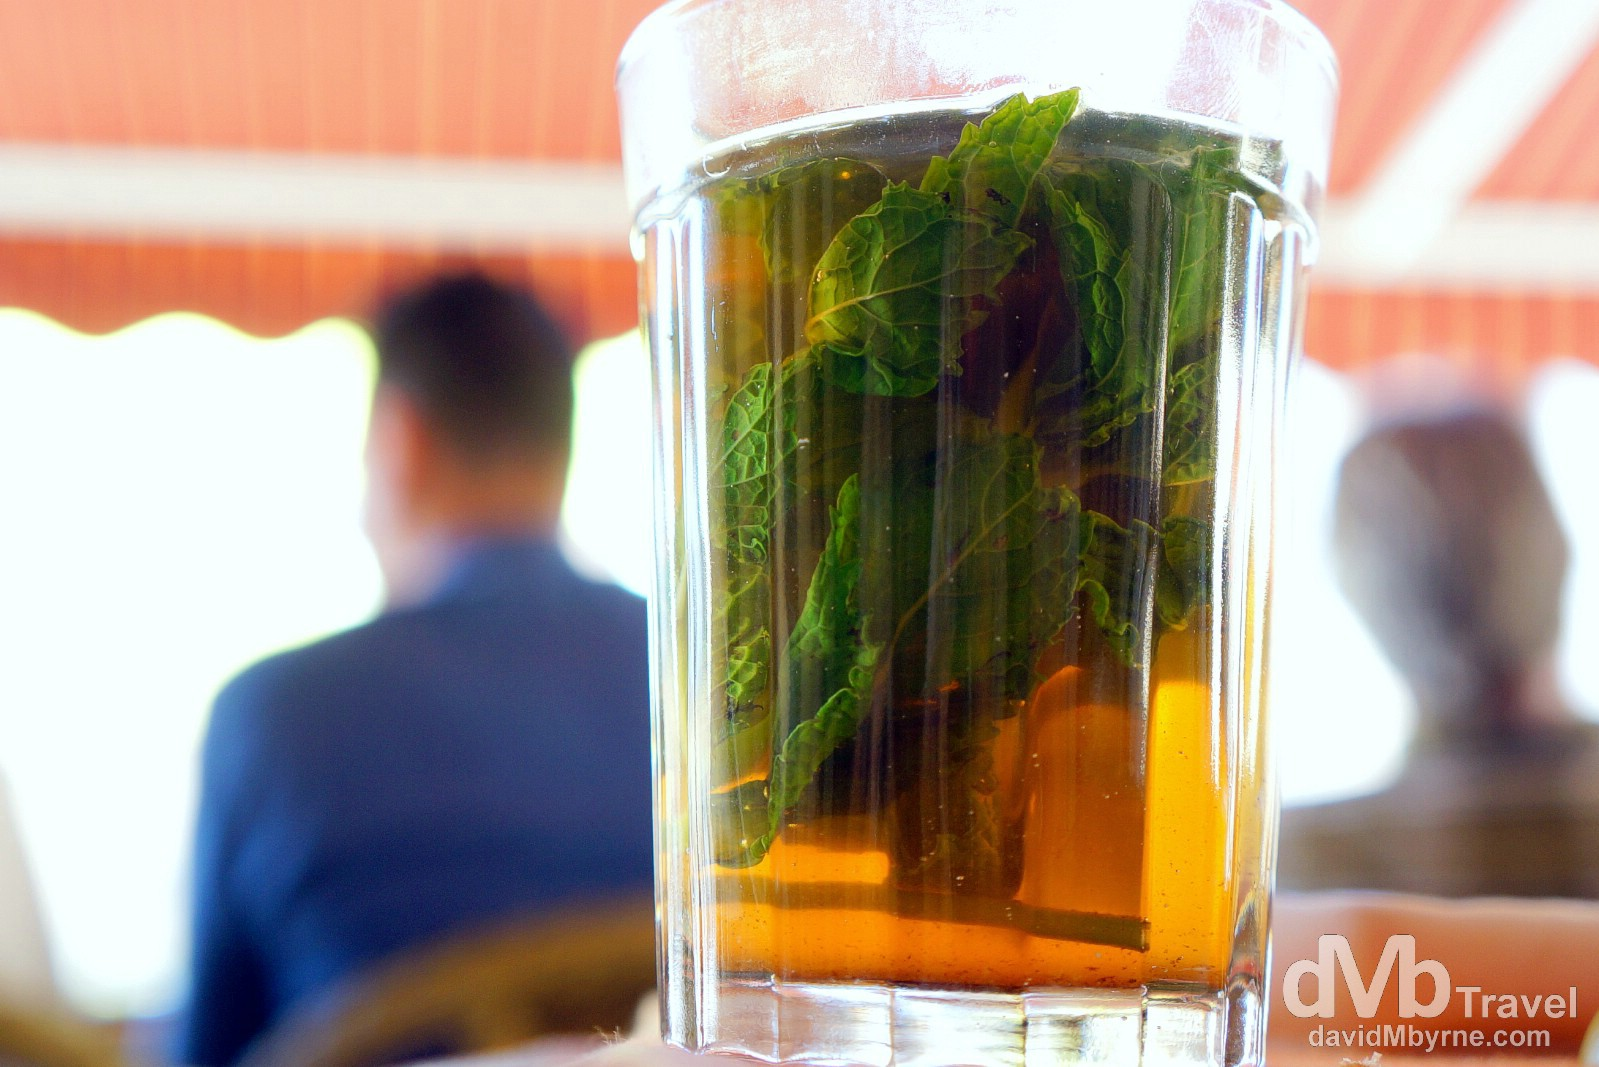 Mint tea, aka Moroccan Whiskey, Fes, Morocco. May 27th, 2014.